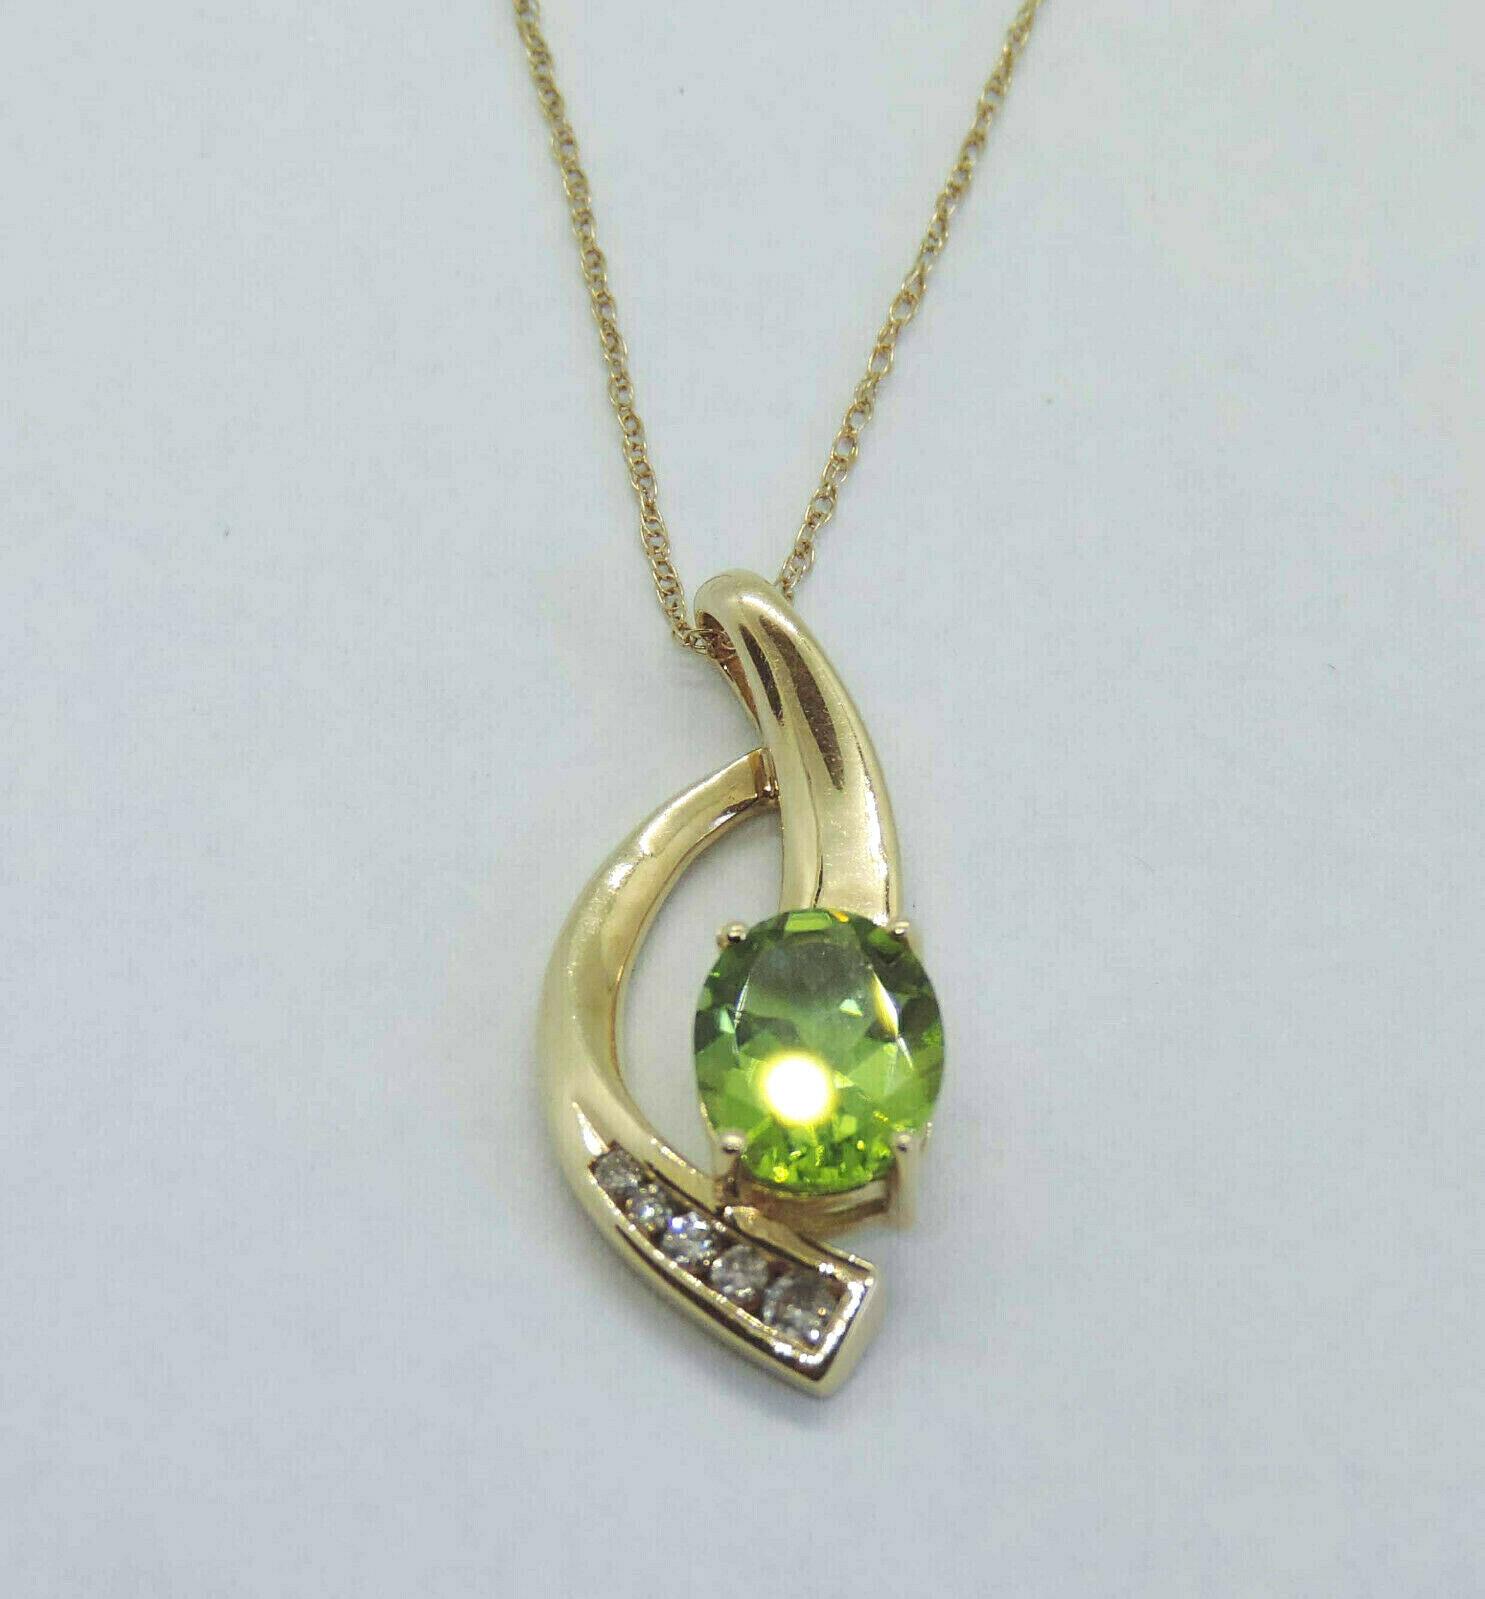 Ladies Genuine Oval Peridot Gemstone Pendant w  5 Gen. Dia. - 14k Yellow gold